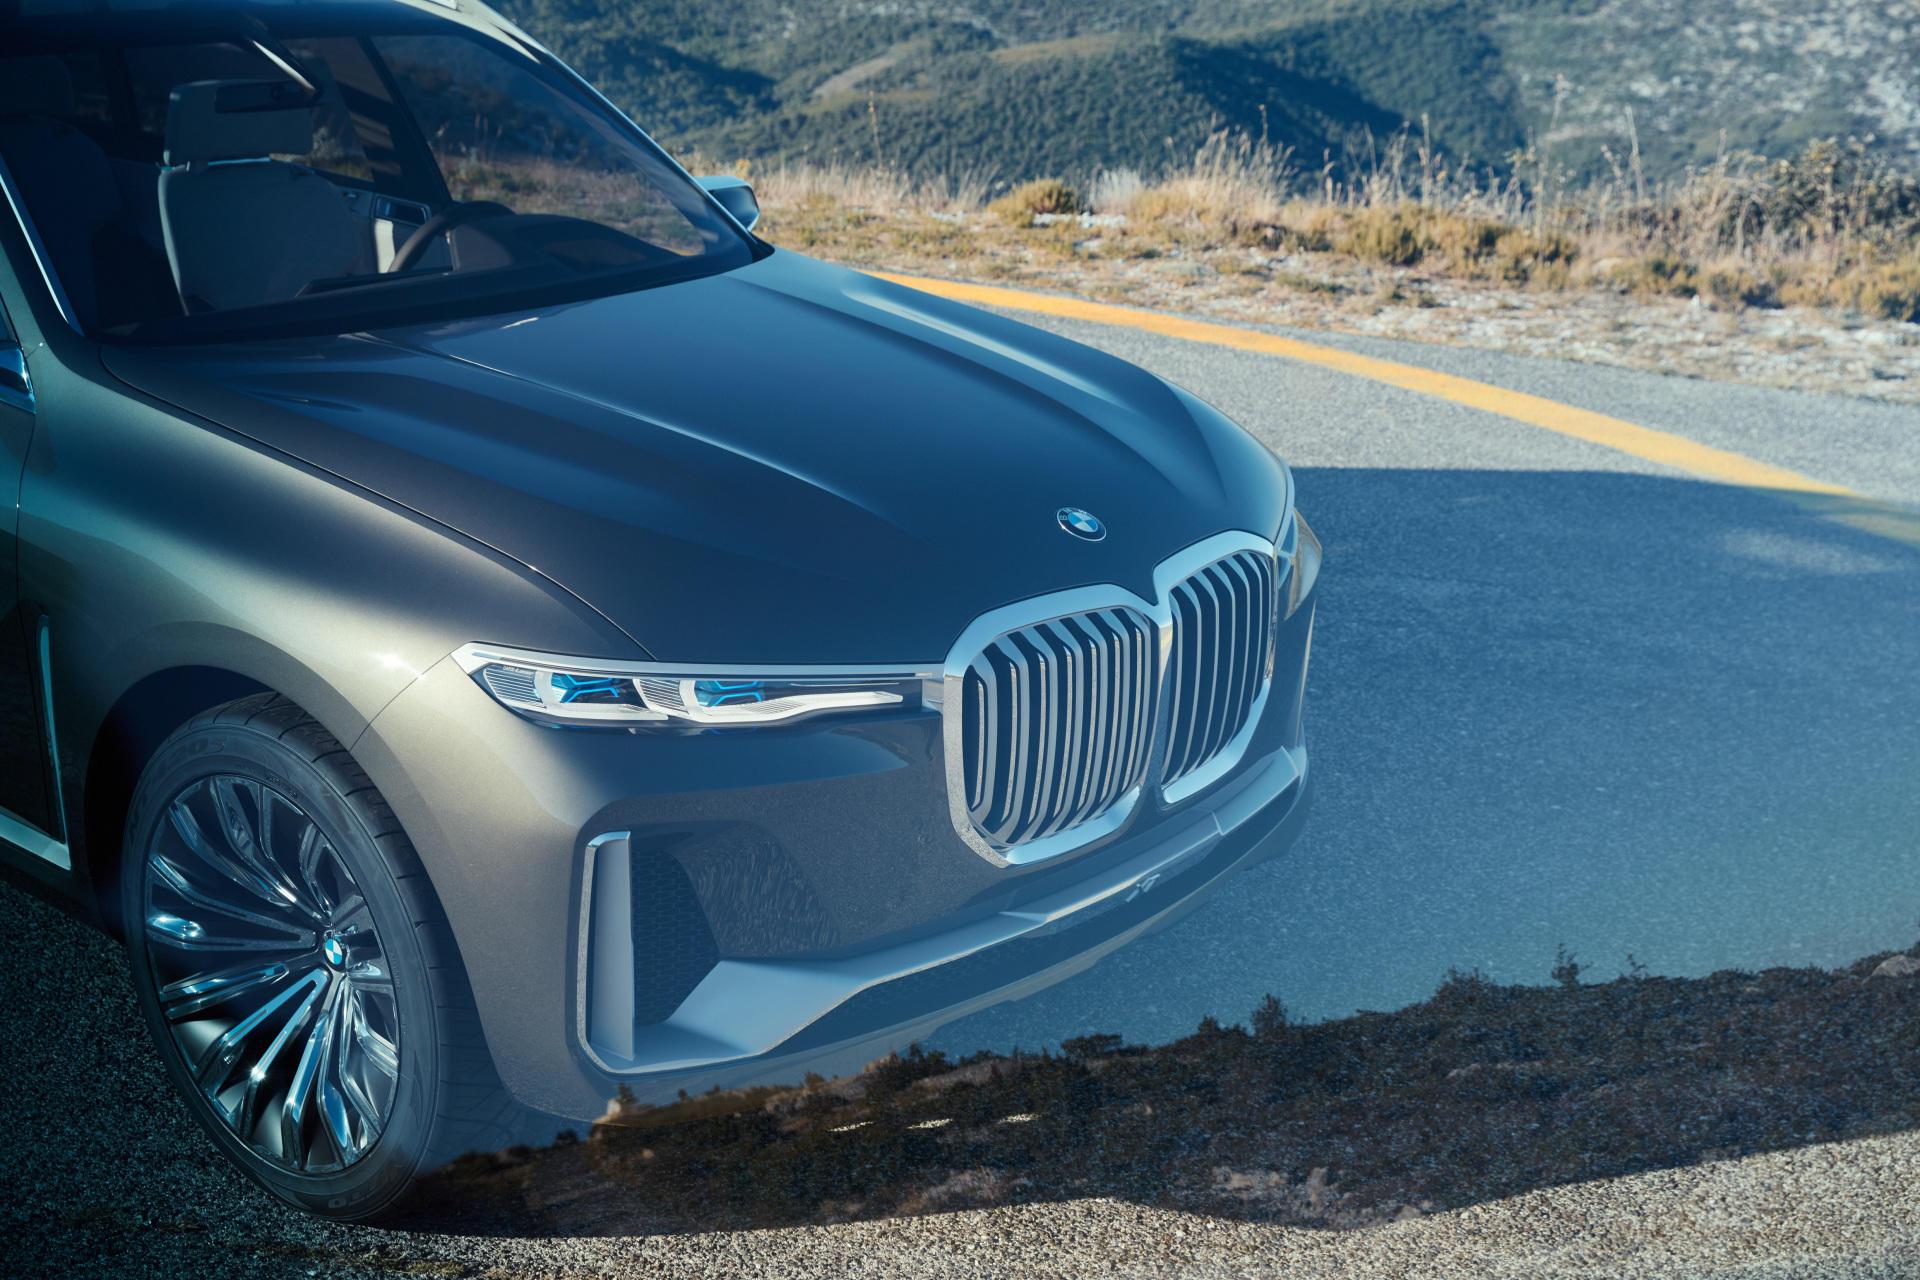 BMW-x7-concept-dm-14.jpg